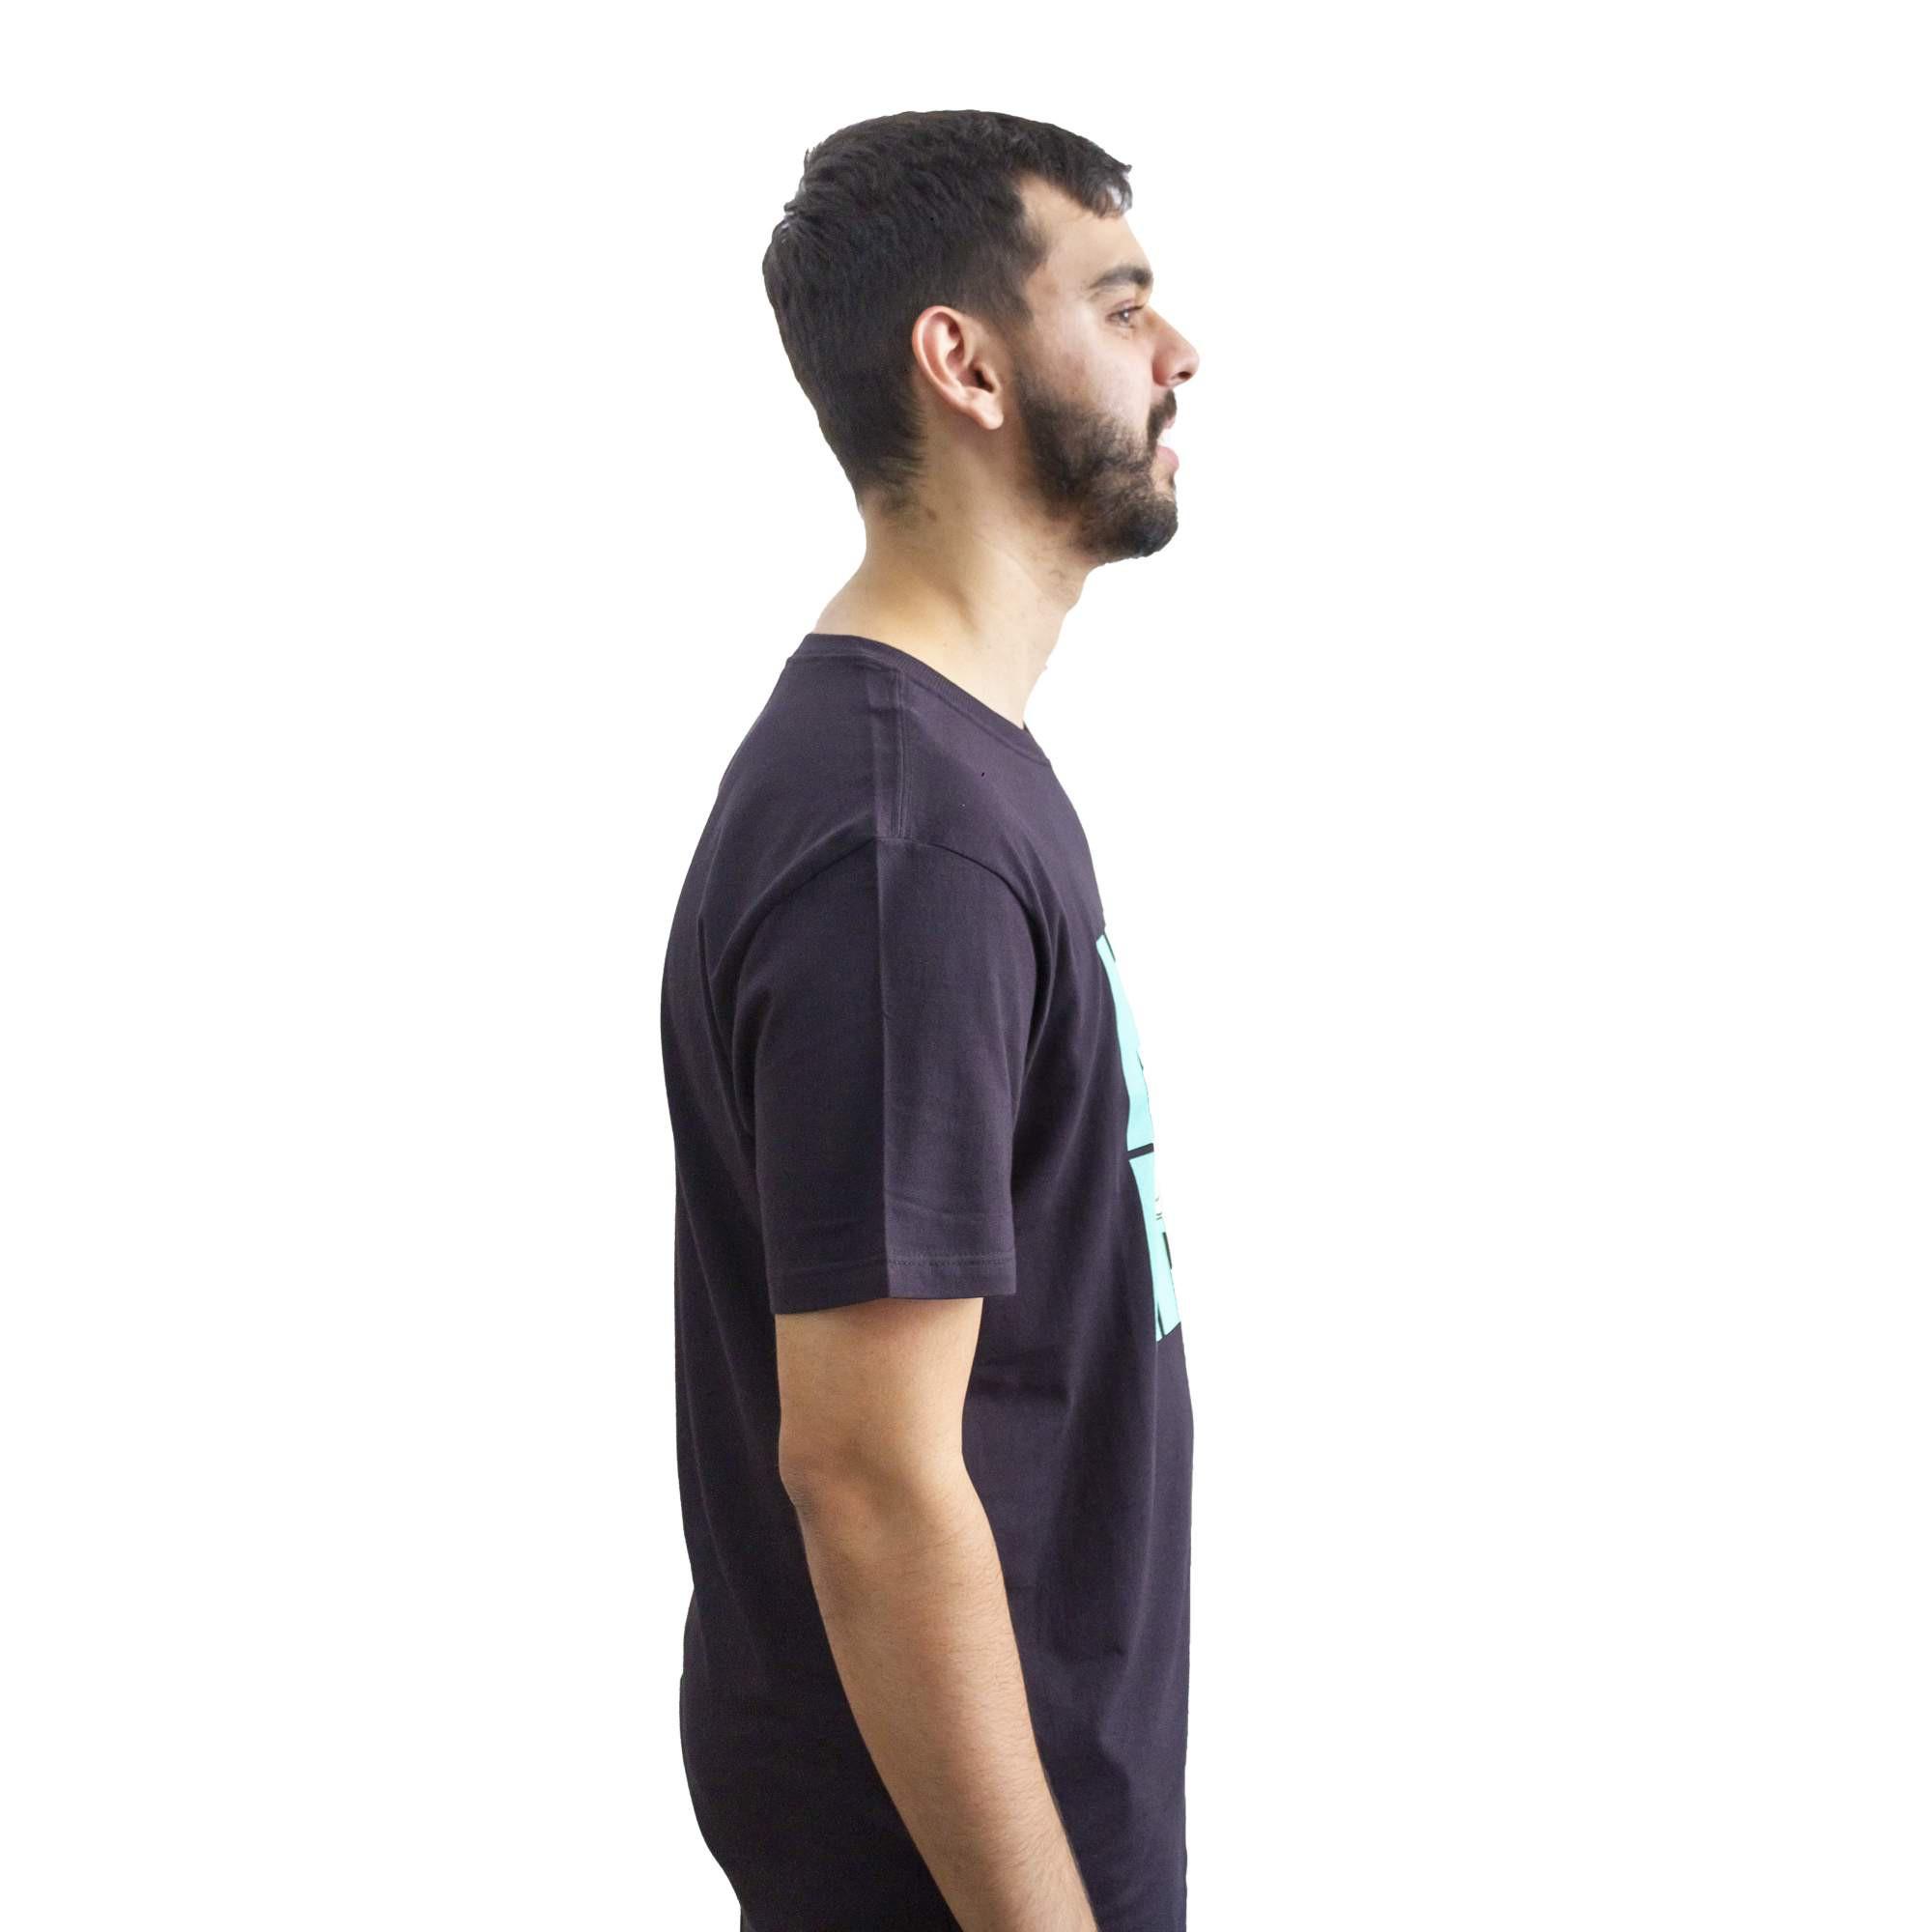 Camiseta New Era Beisibol